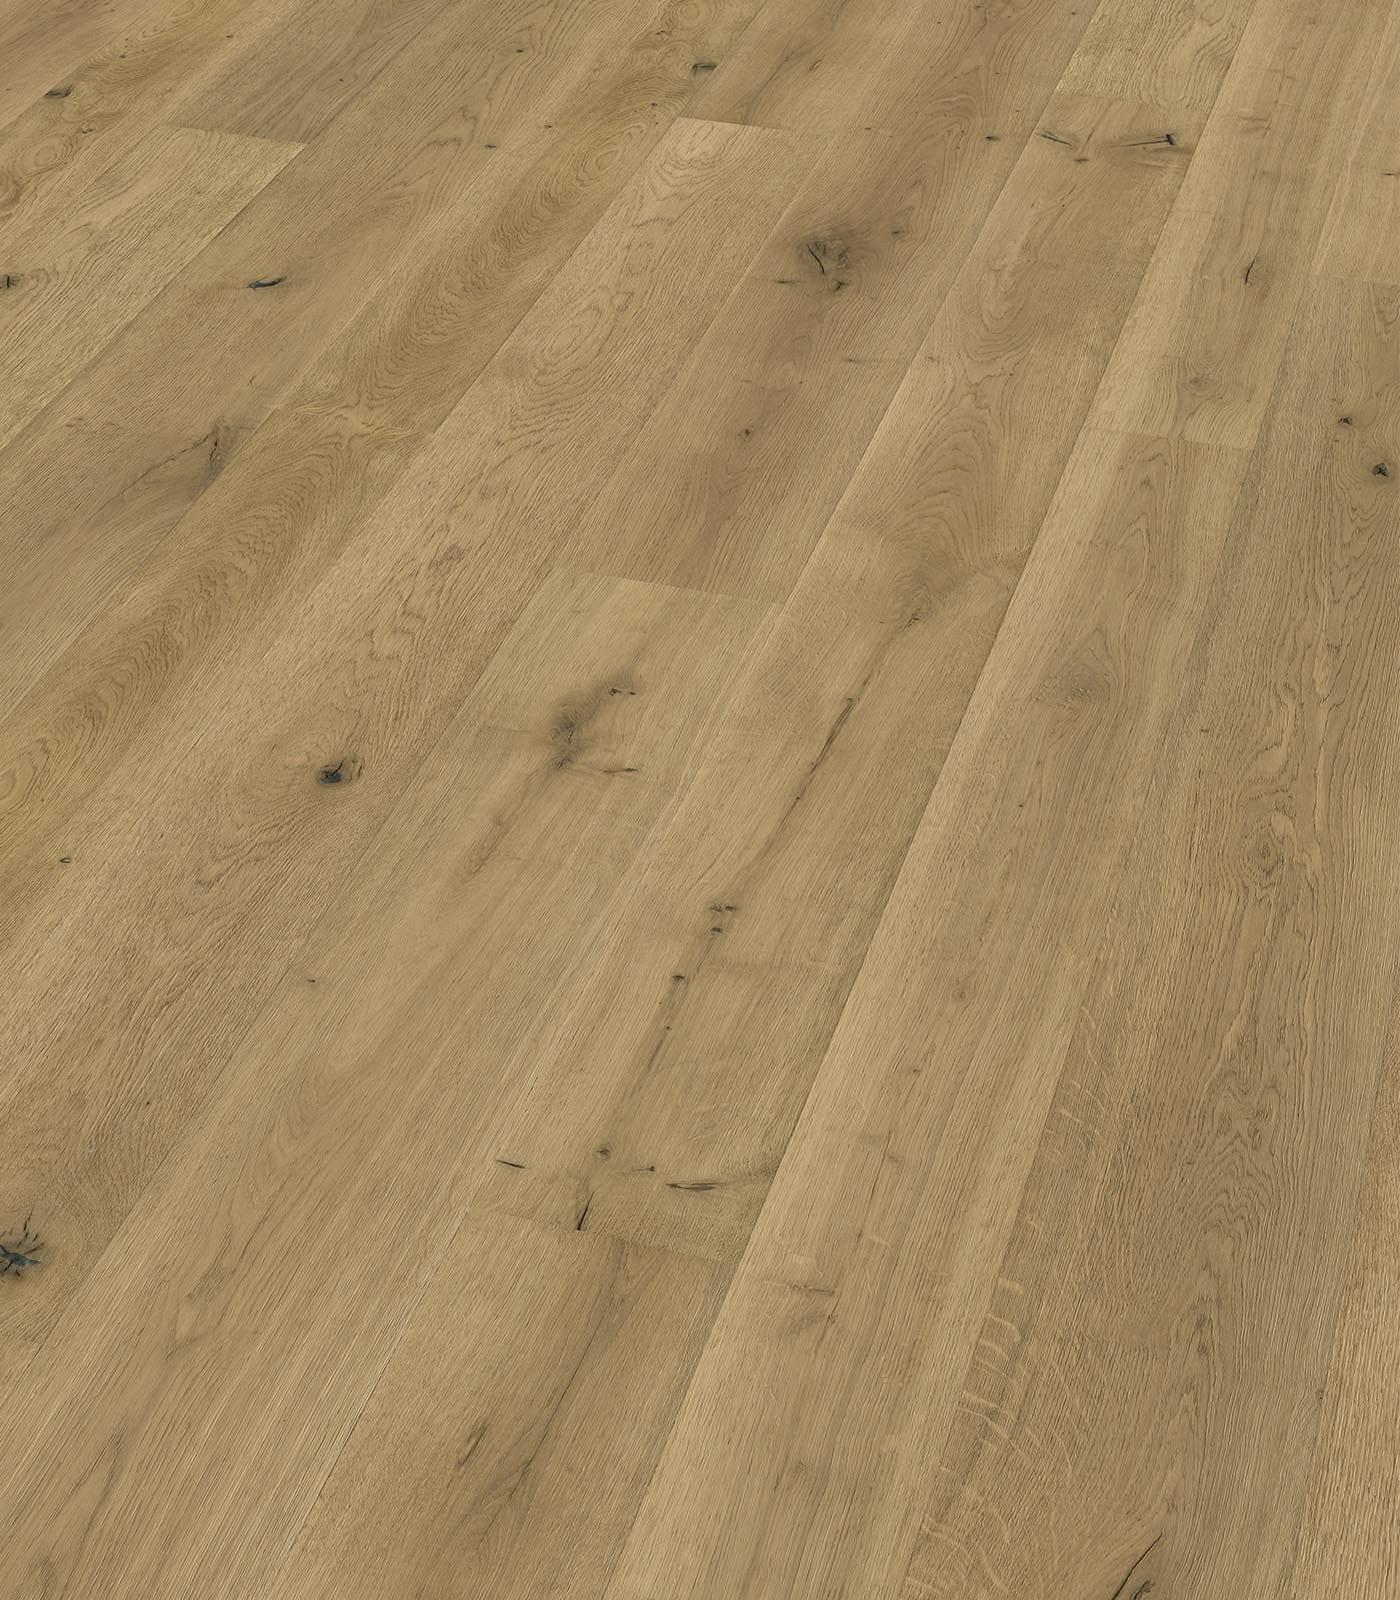 Evora-Heritage Collection-European Oak floors-angle